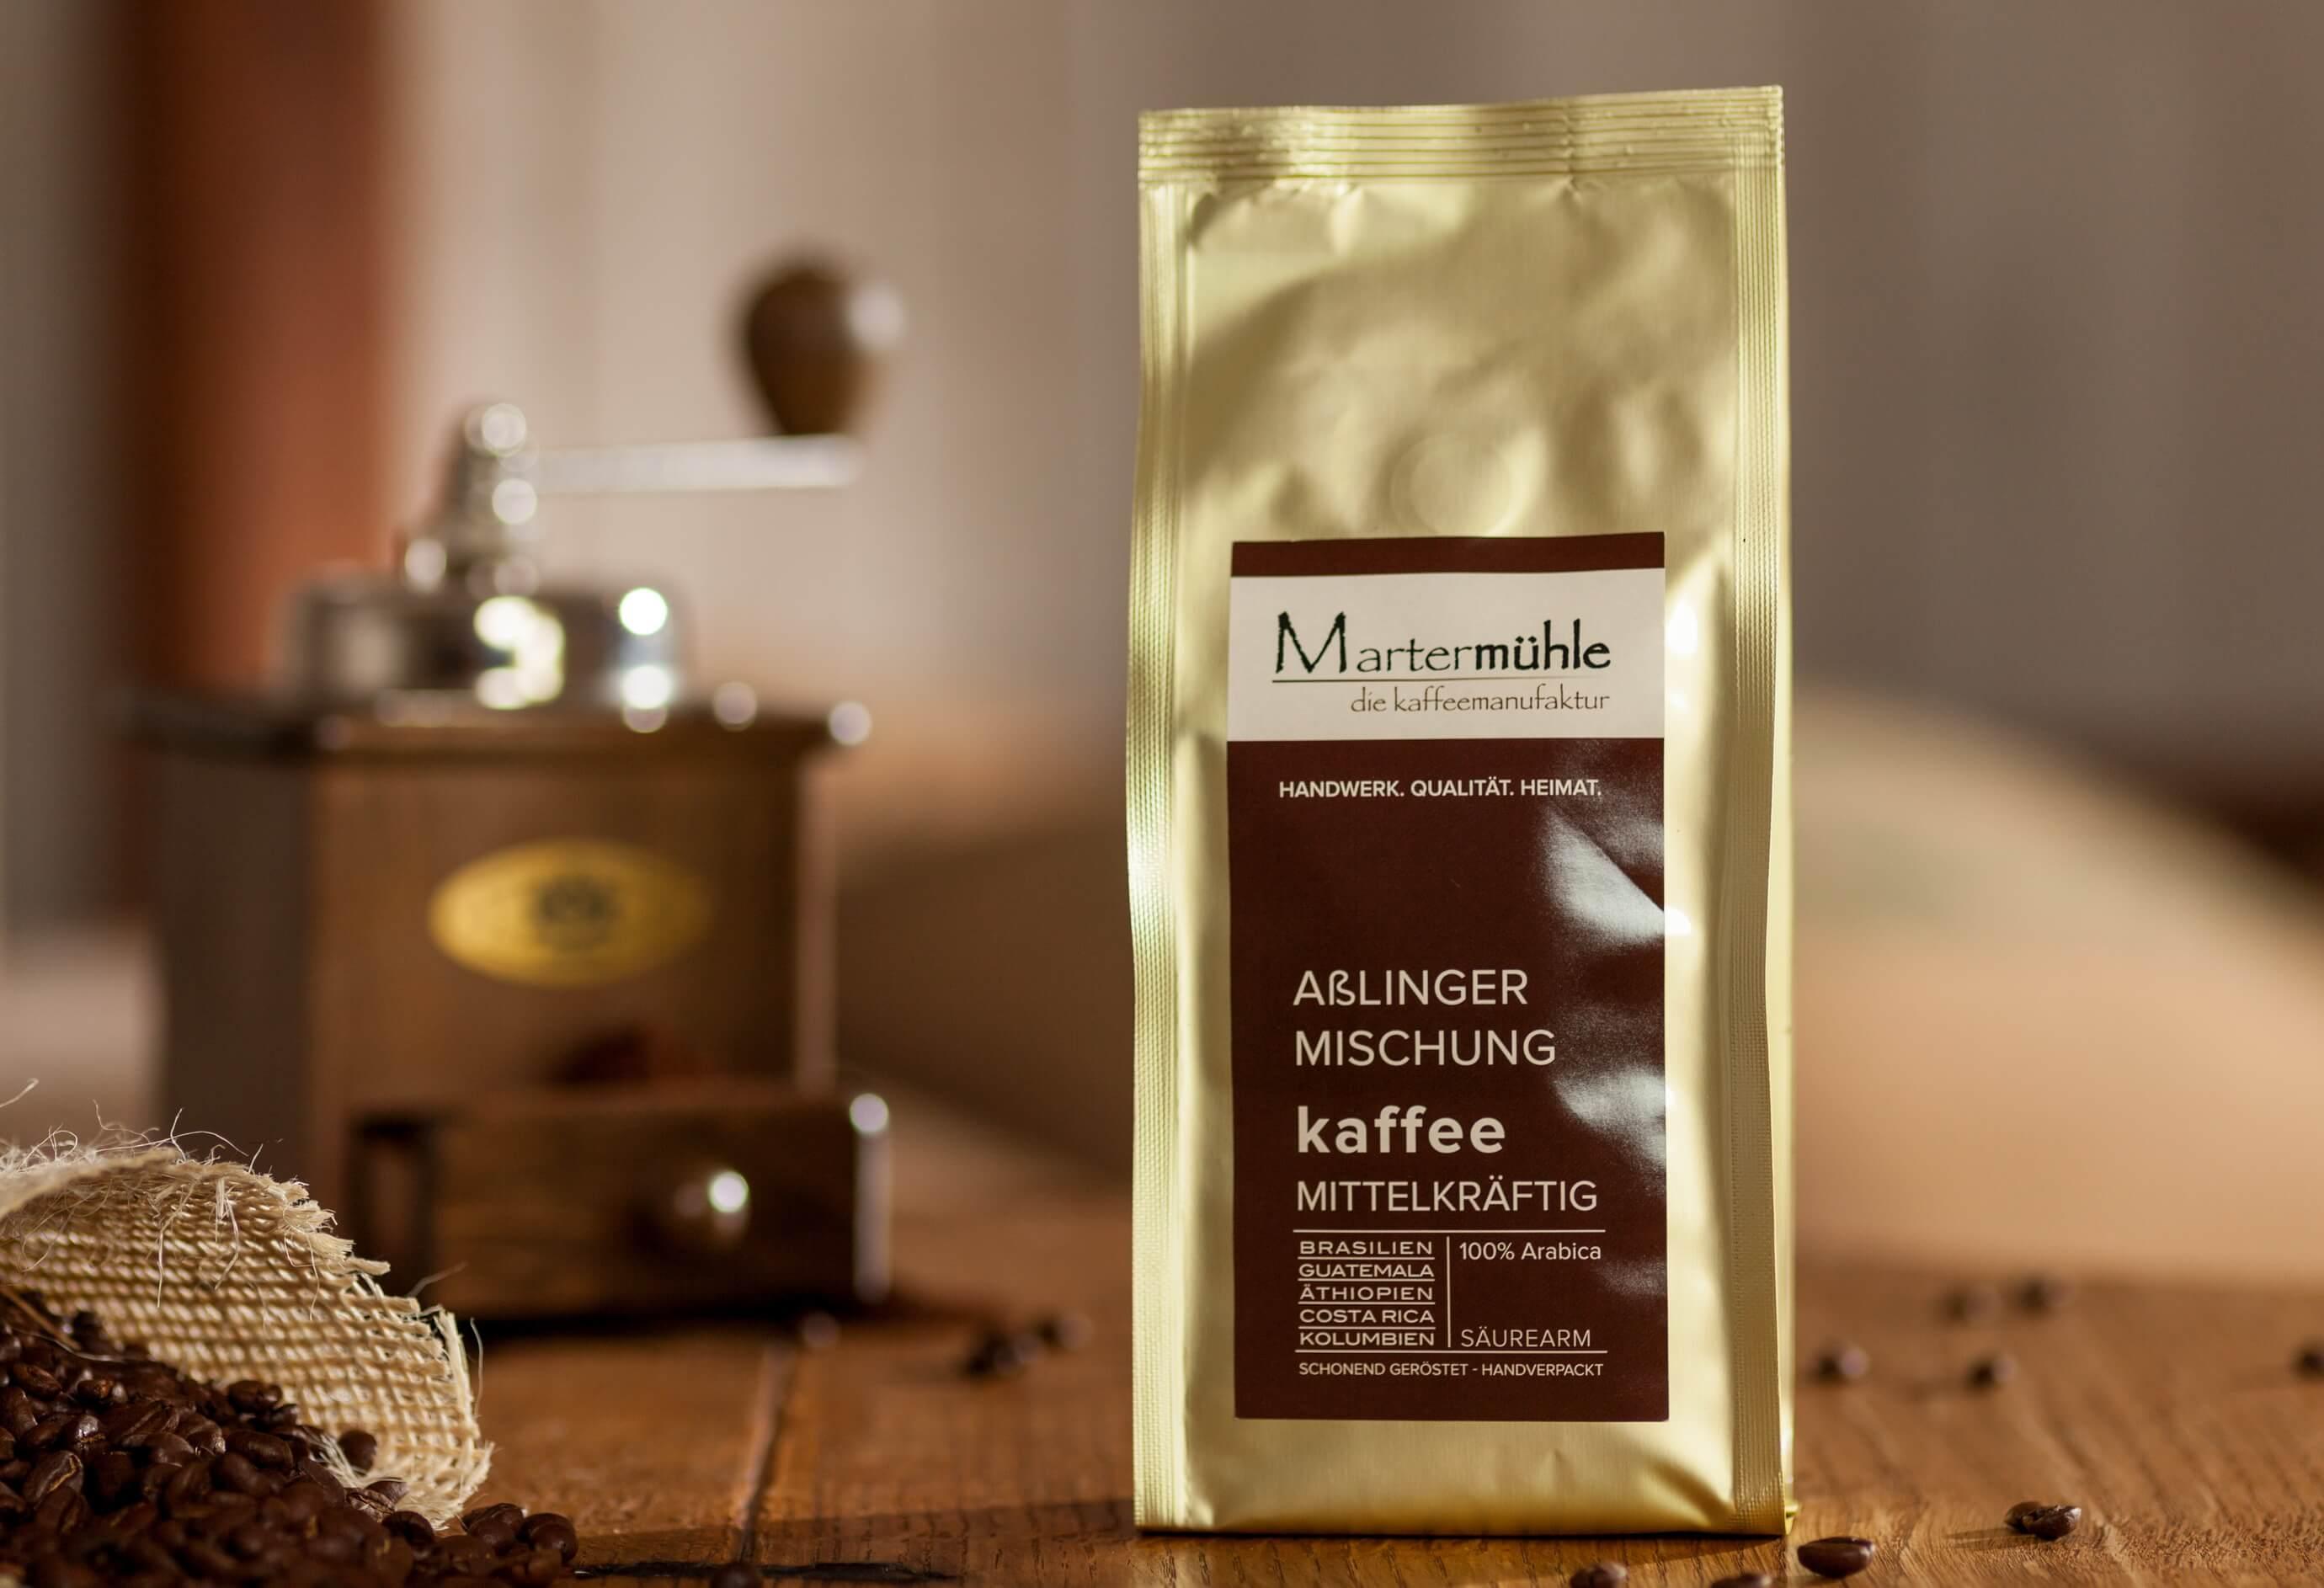 kaffee a linger mischung kaufen kaffeer sterei marterm hle. Black Bedroom Furniture Sets. Home Design Ideas